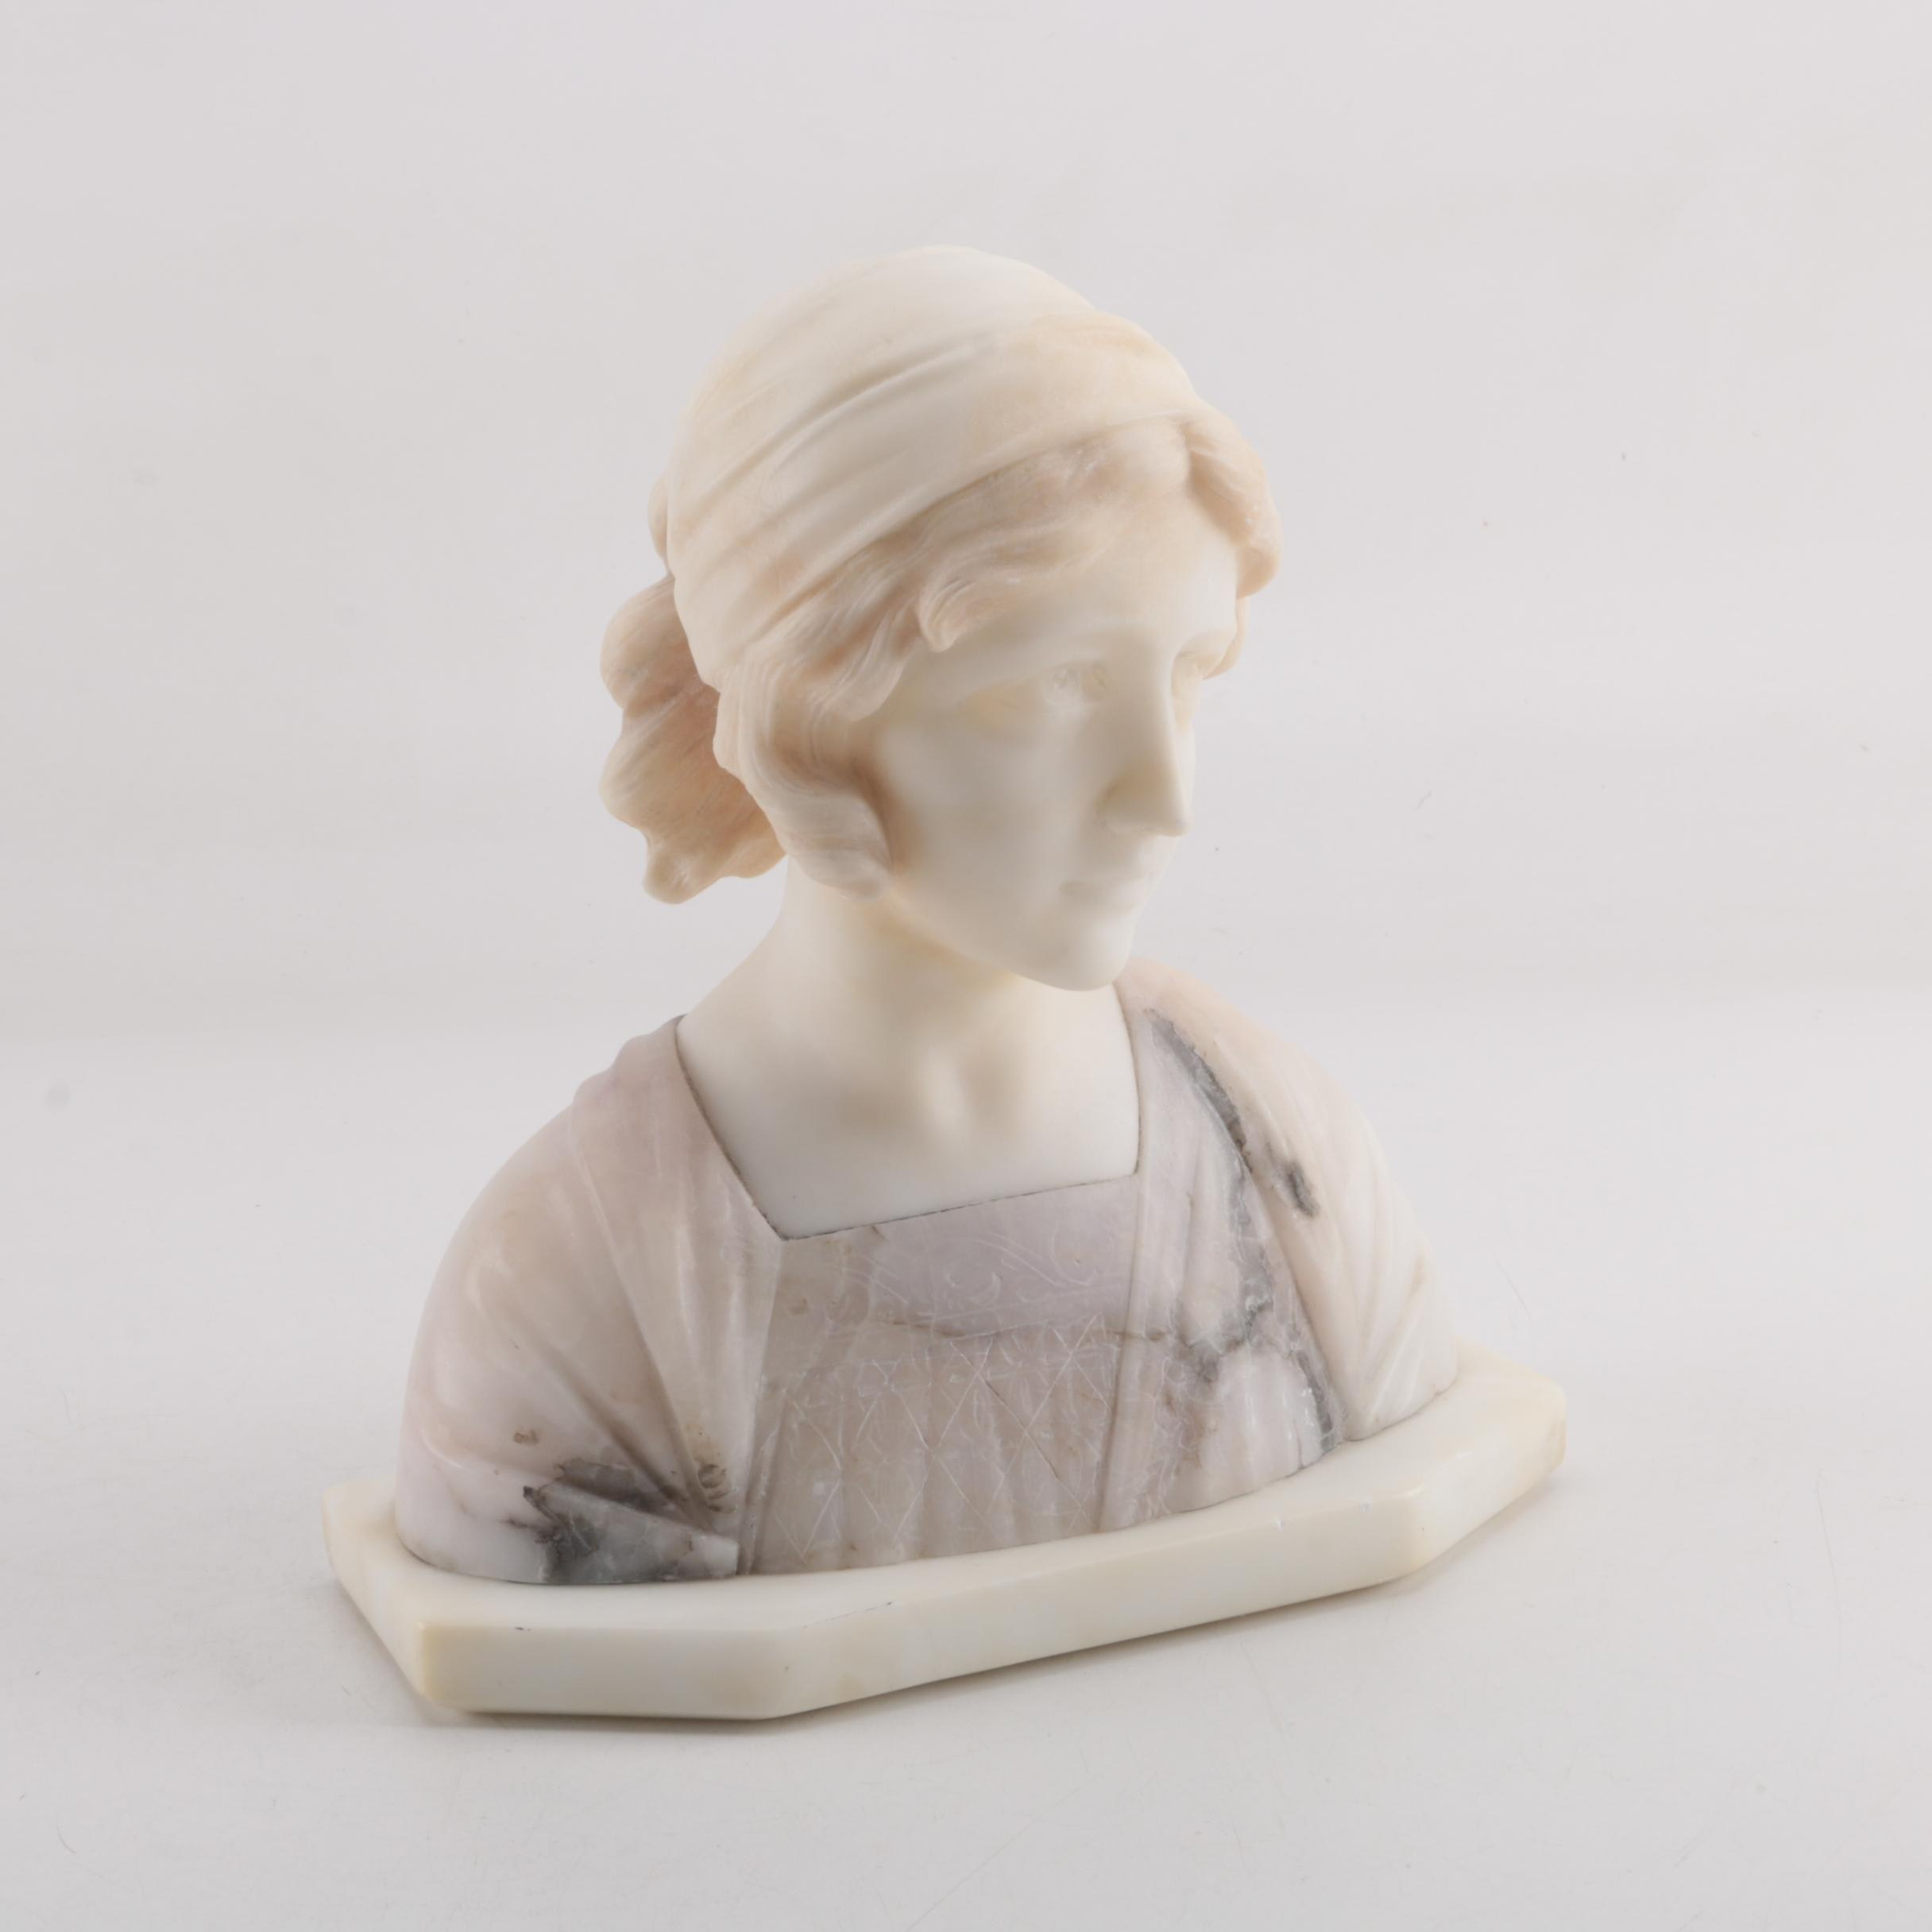 Enrico Castellucci Alabaster Sculpture